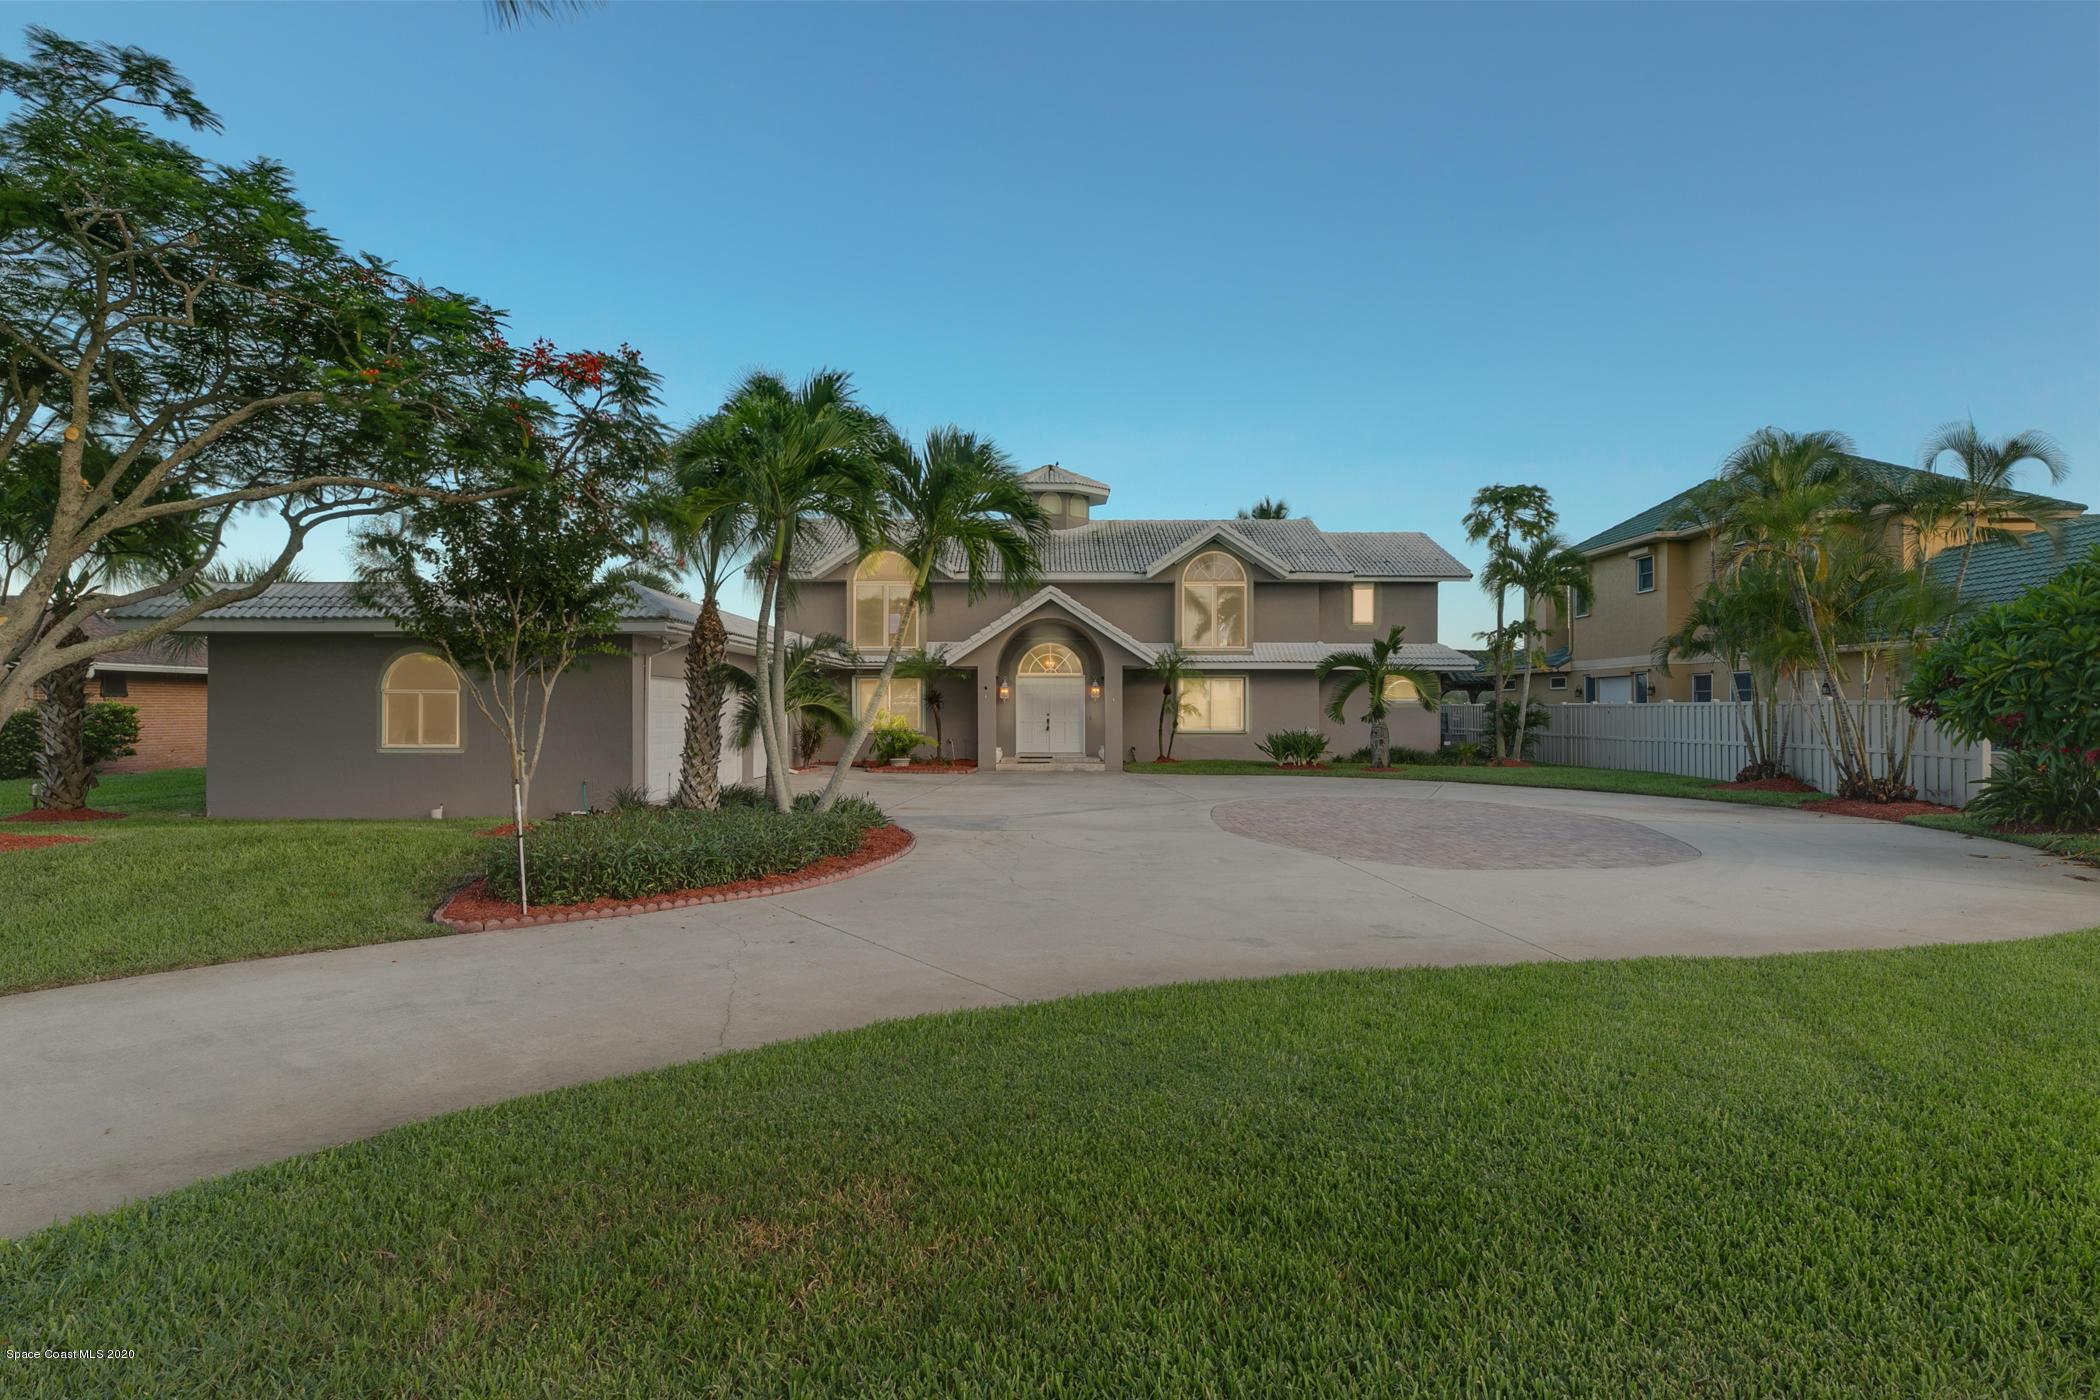 Photo of 441 S Banana River Boulevard, Cocoa Beach, FL 32931